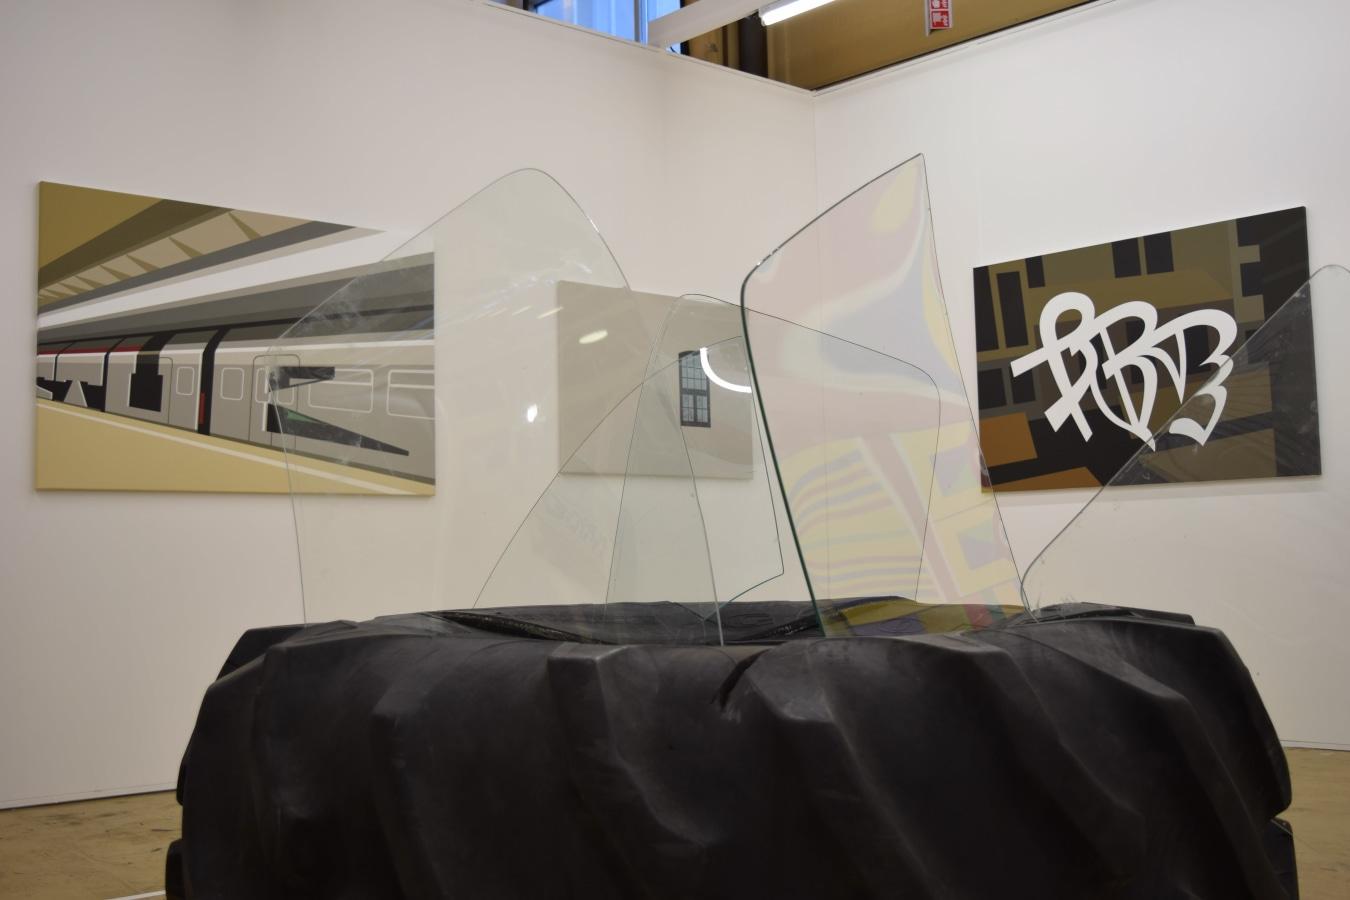 Art Rotterdam | 2020, Ronald de Bloeme, Marinus Boezem, Jurriaan Molenaar, Carel Visser,